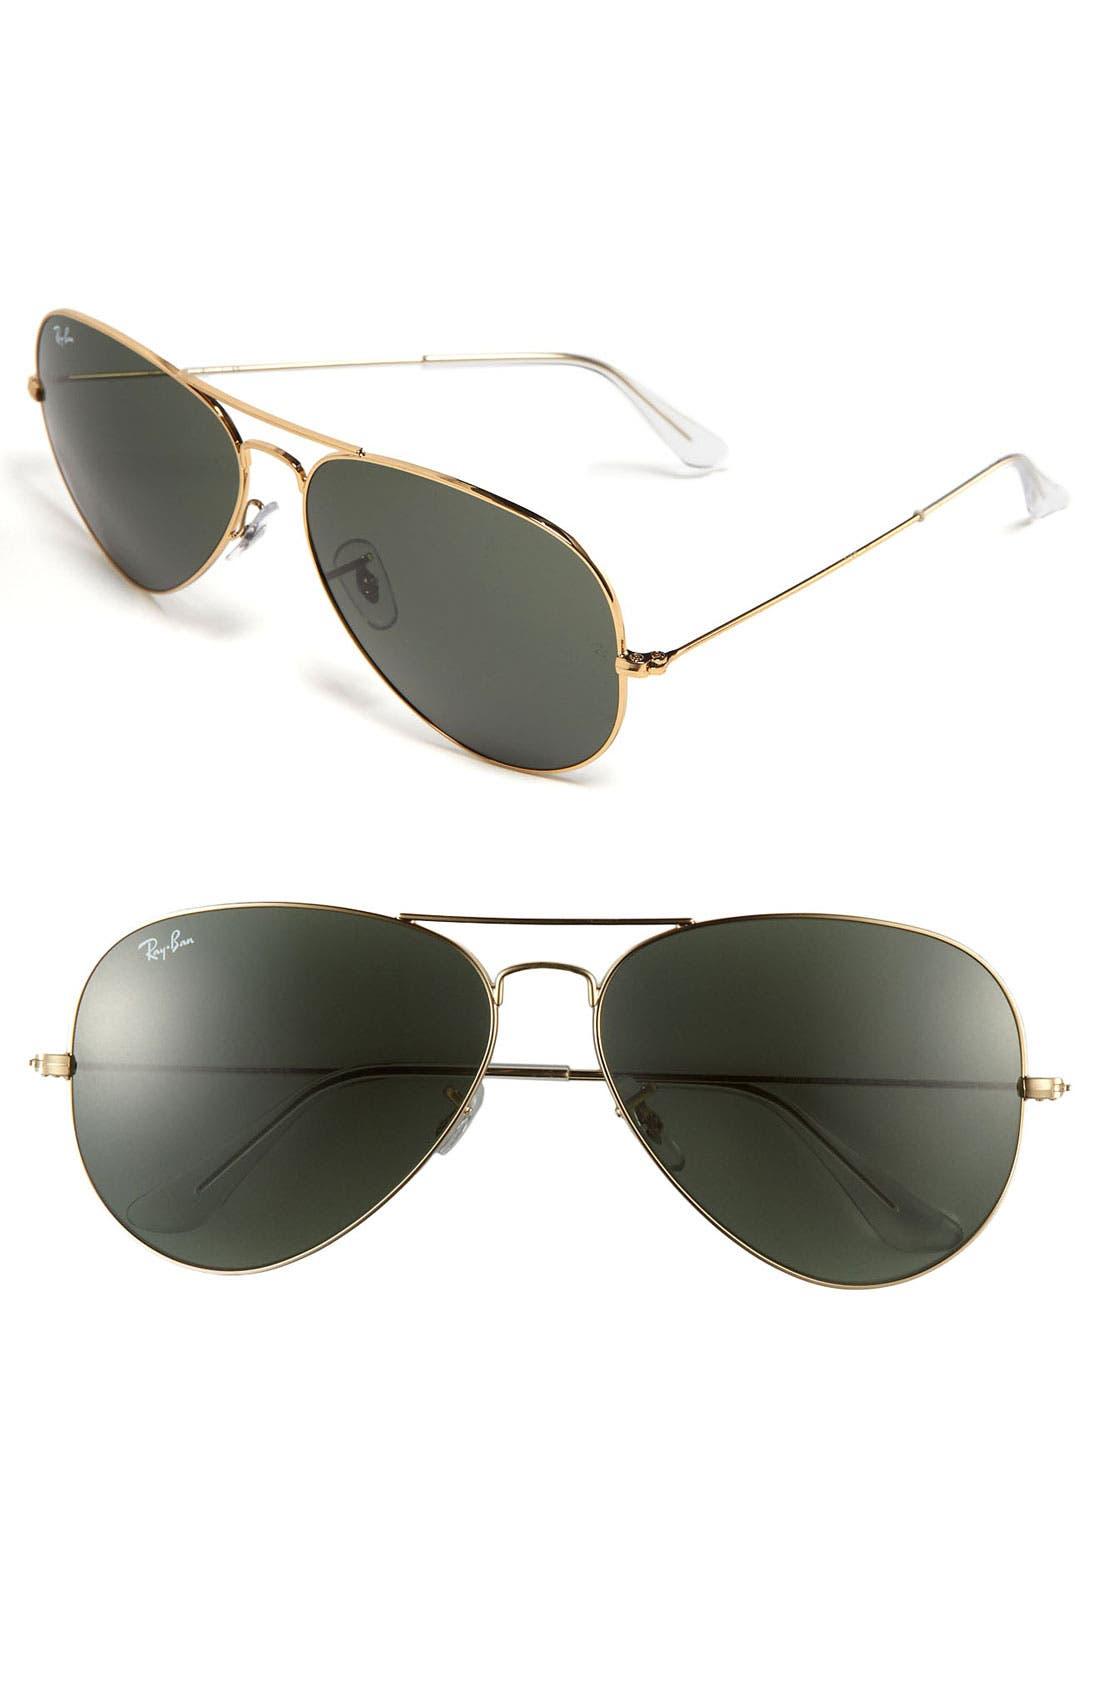 Main Image - Ray-Ban 'Org Aviator' 62mm Sunglasses